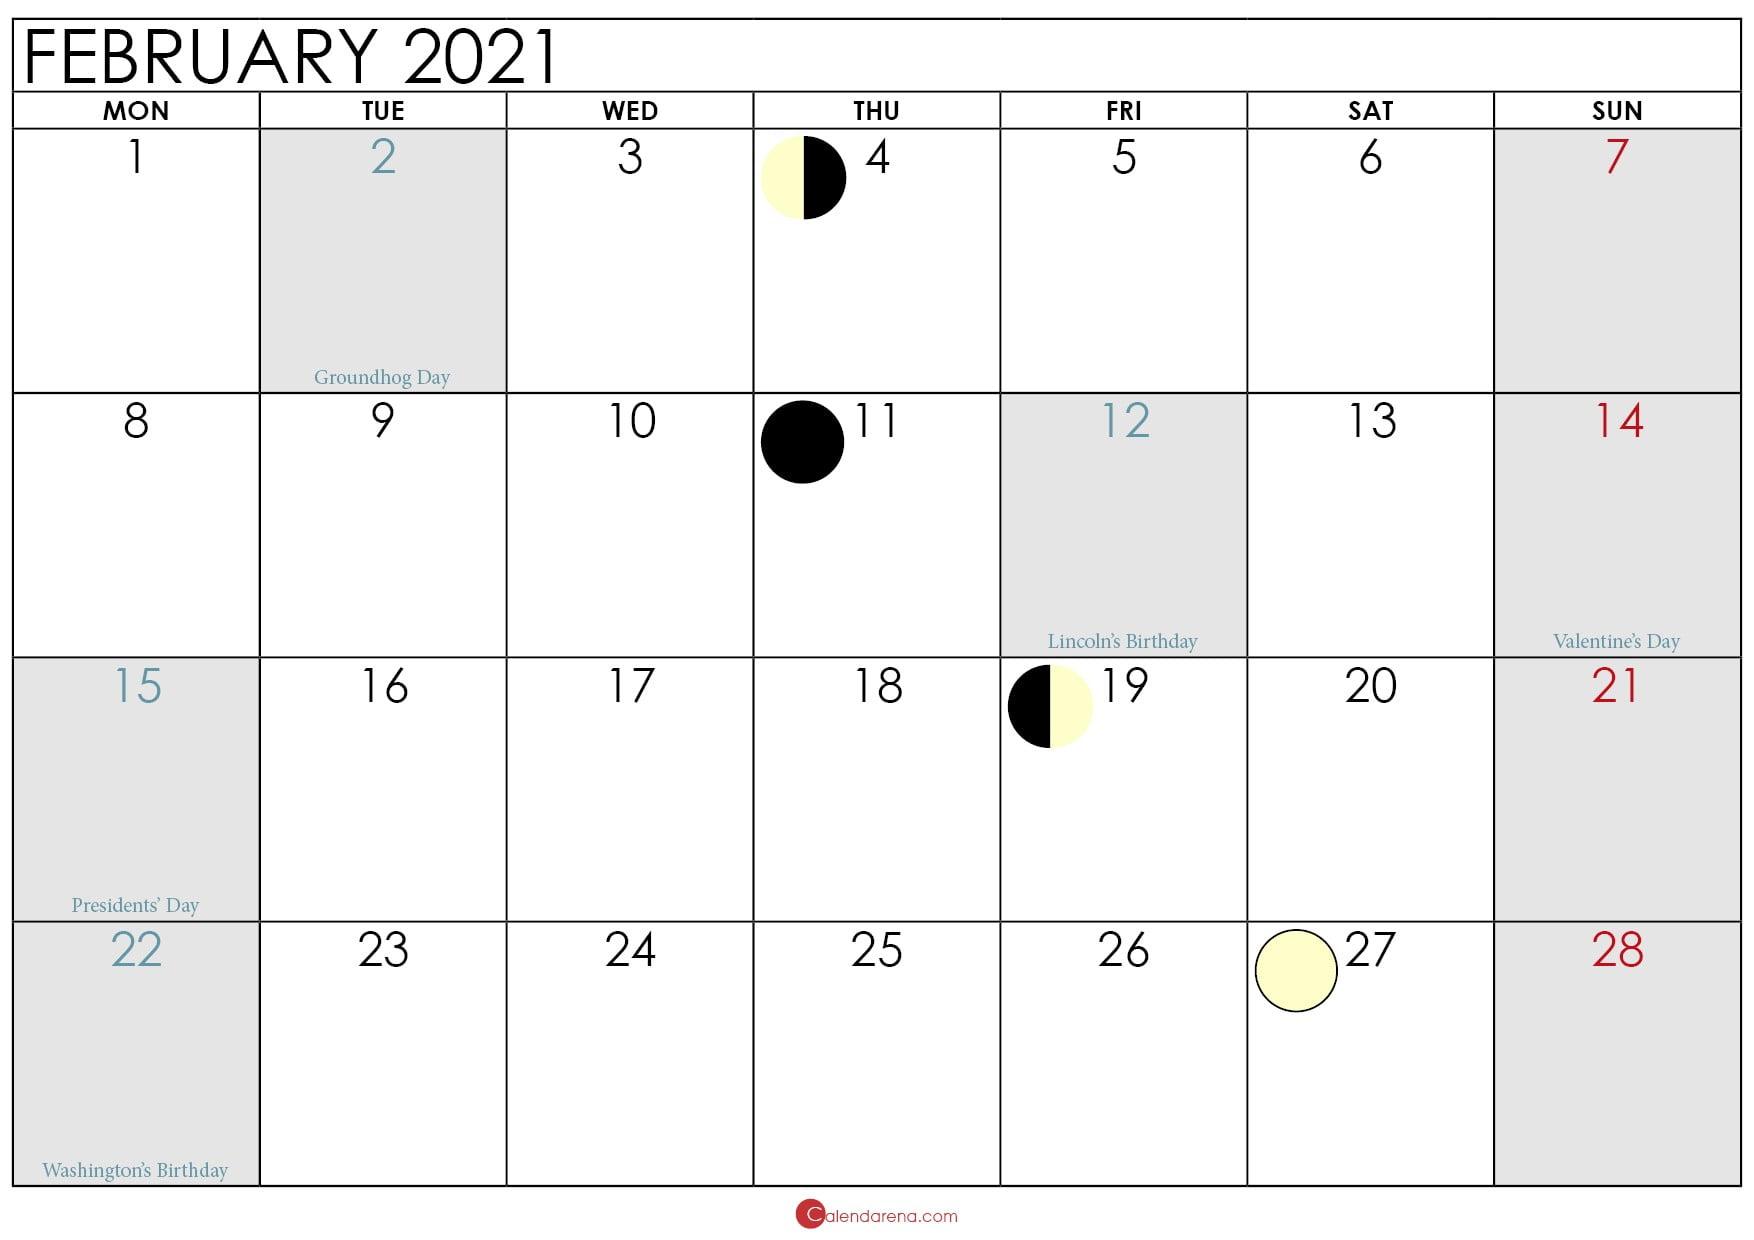 moon phase february 2021